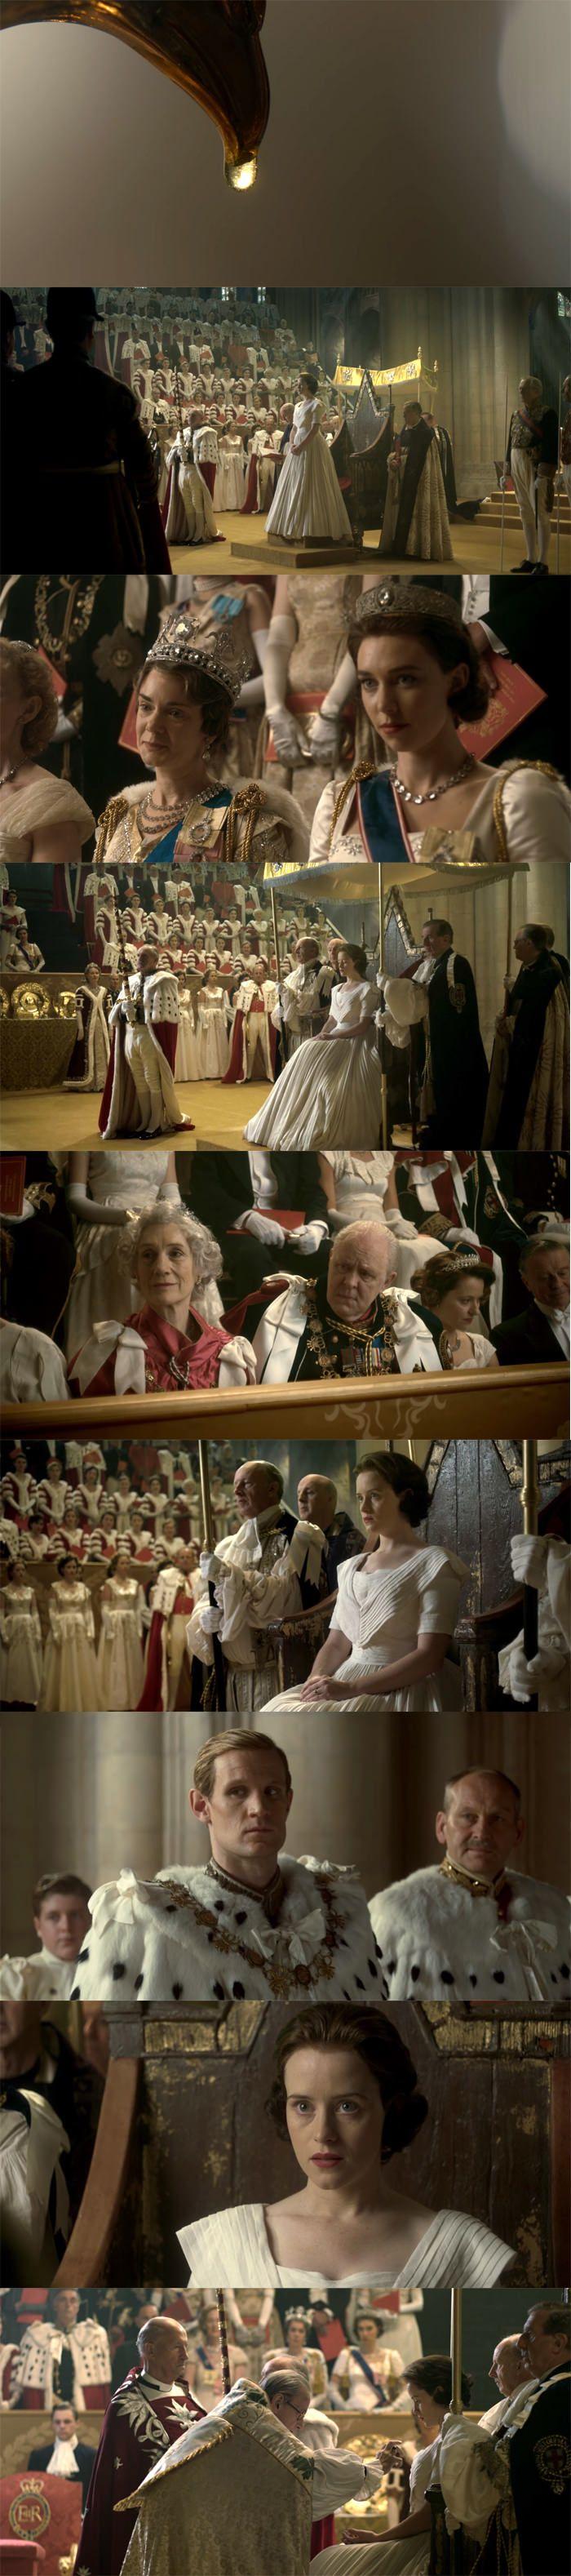 the-crown-season-1-episode-4-smoke-mirrors-netflix-costumes-analysis-tom-lorenzo-site-14